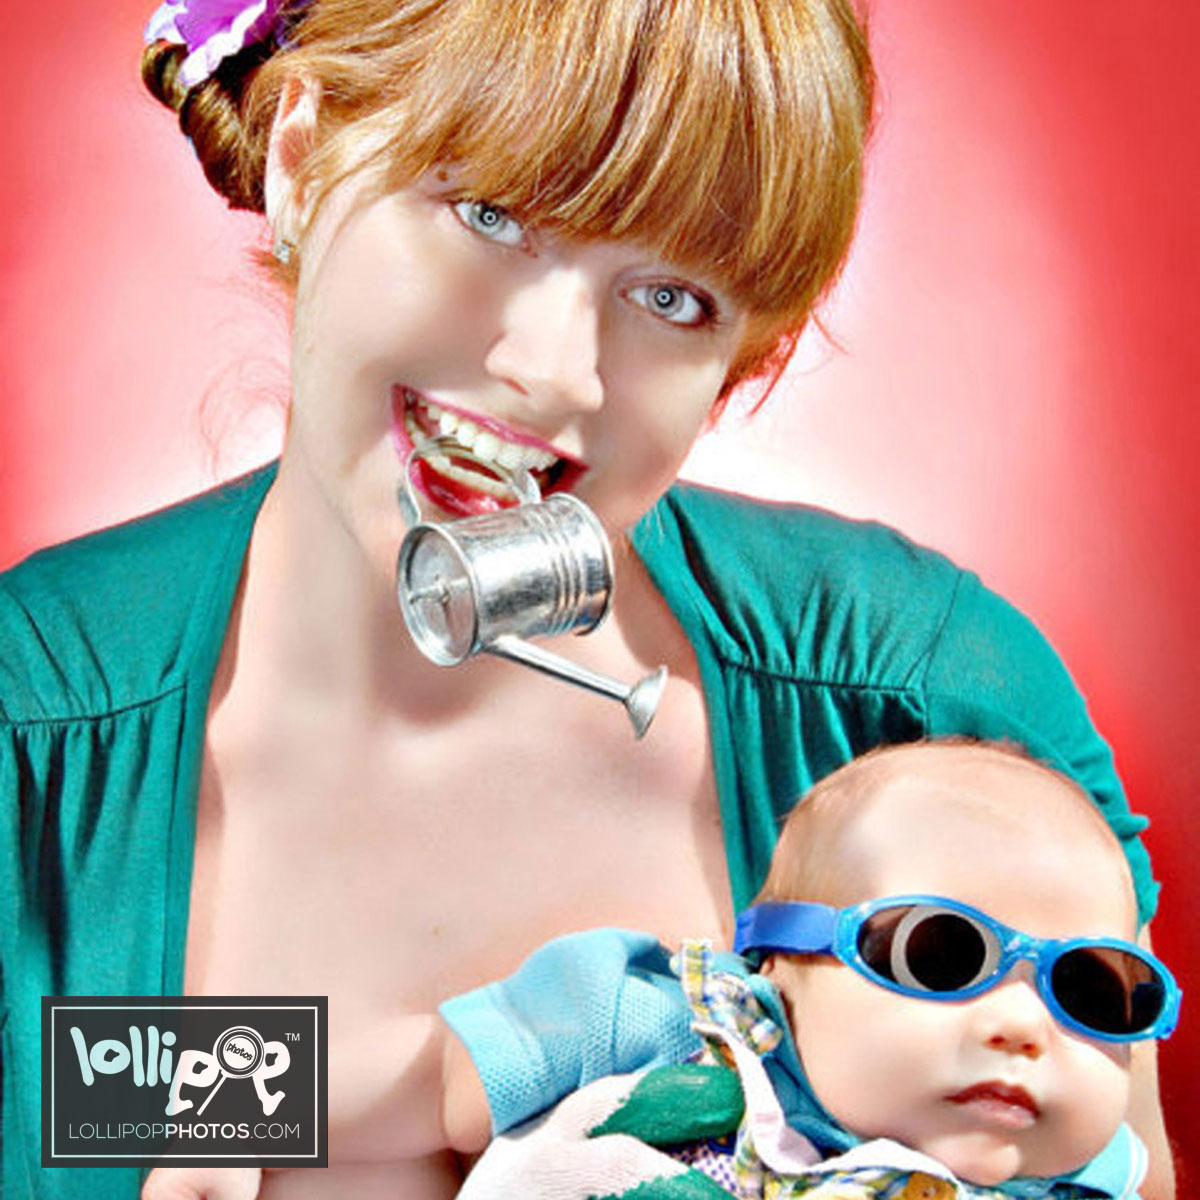 msdig-nora-canfield-lollipop-photos-037.jpg